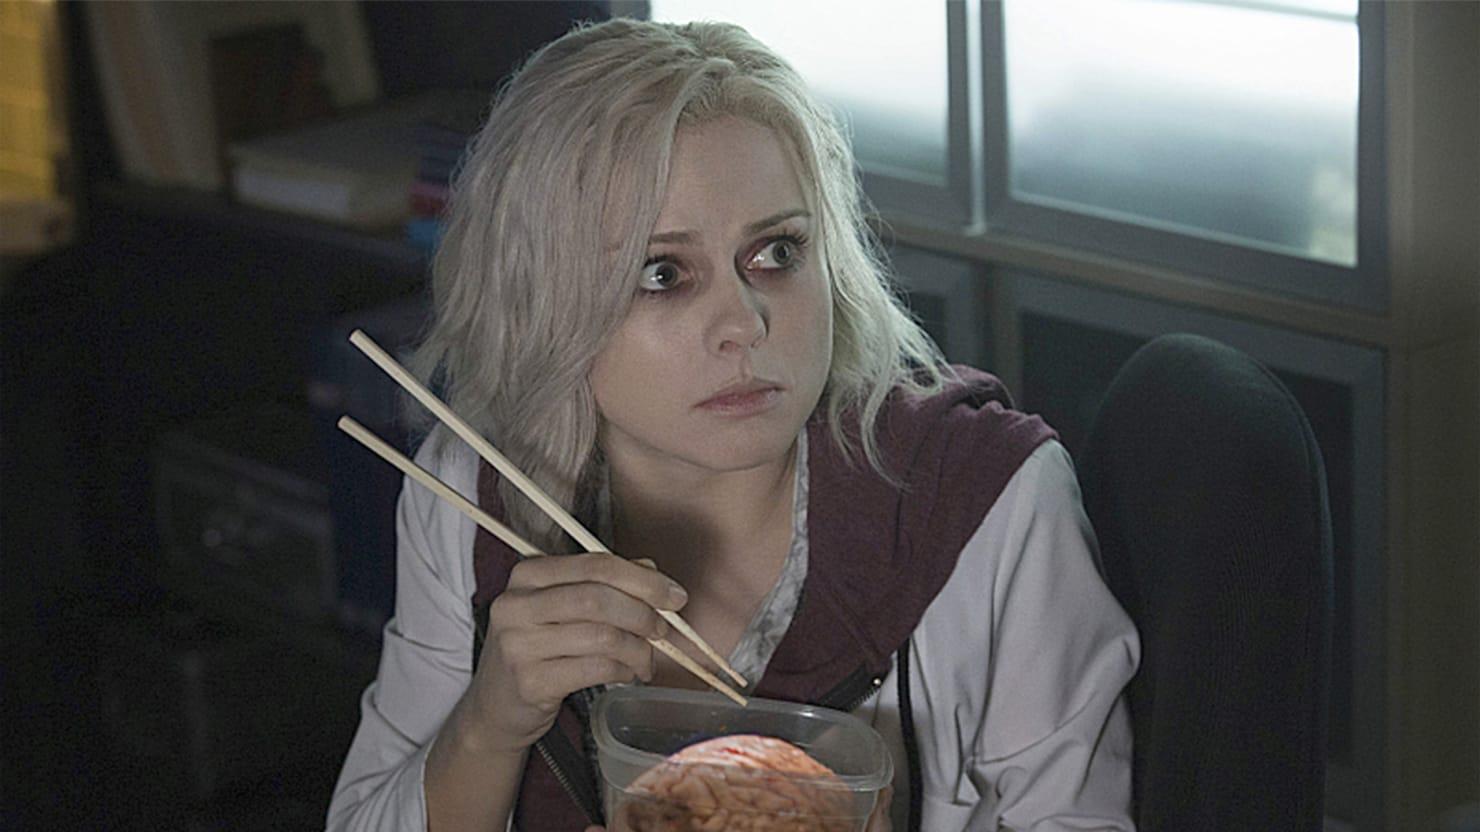 The Zombie 'Veronica Mars': Creator Rob Thomas on the CW Detective Drama 'iZombie'